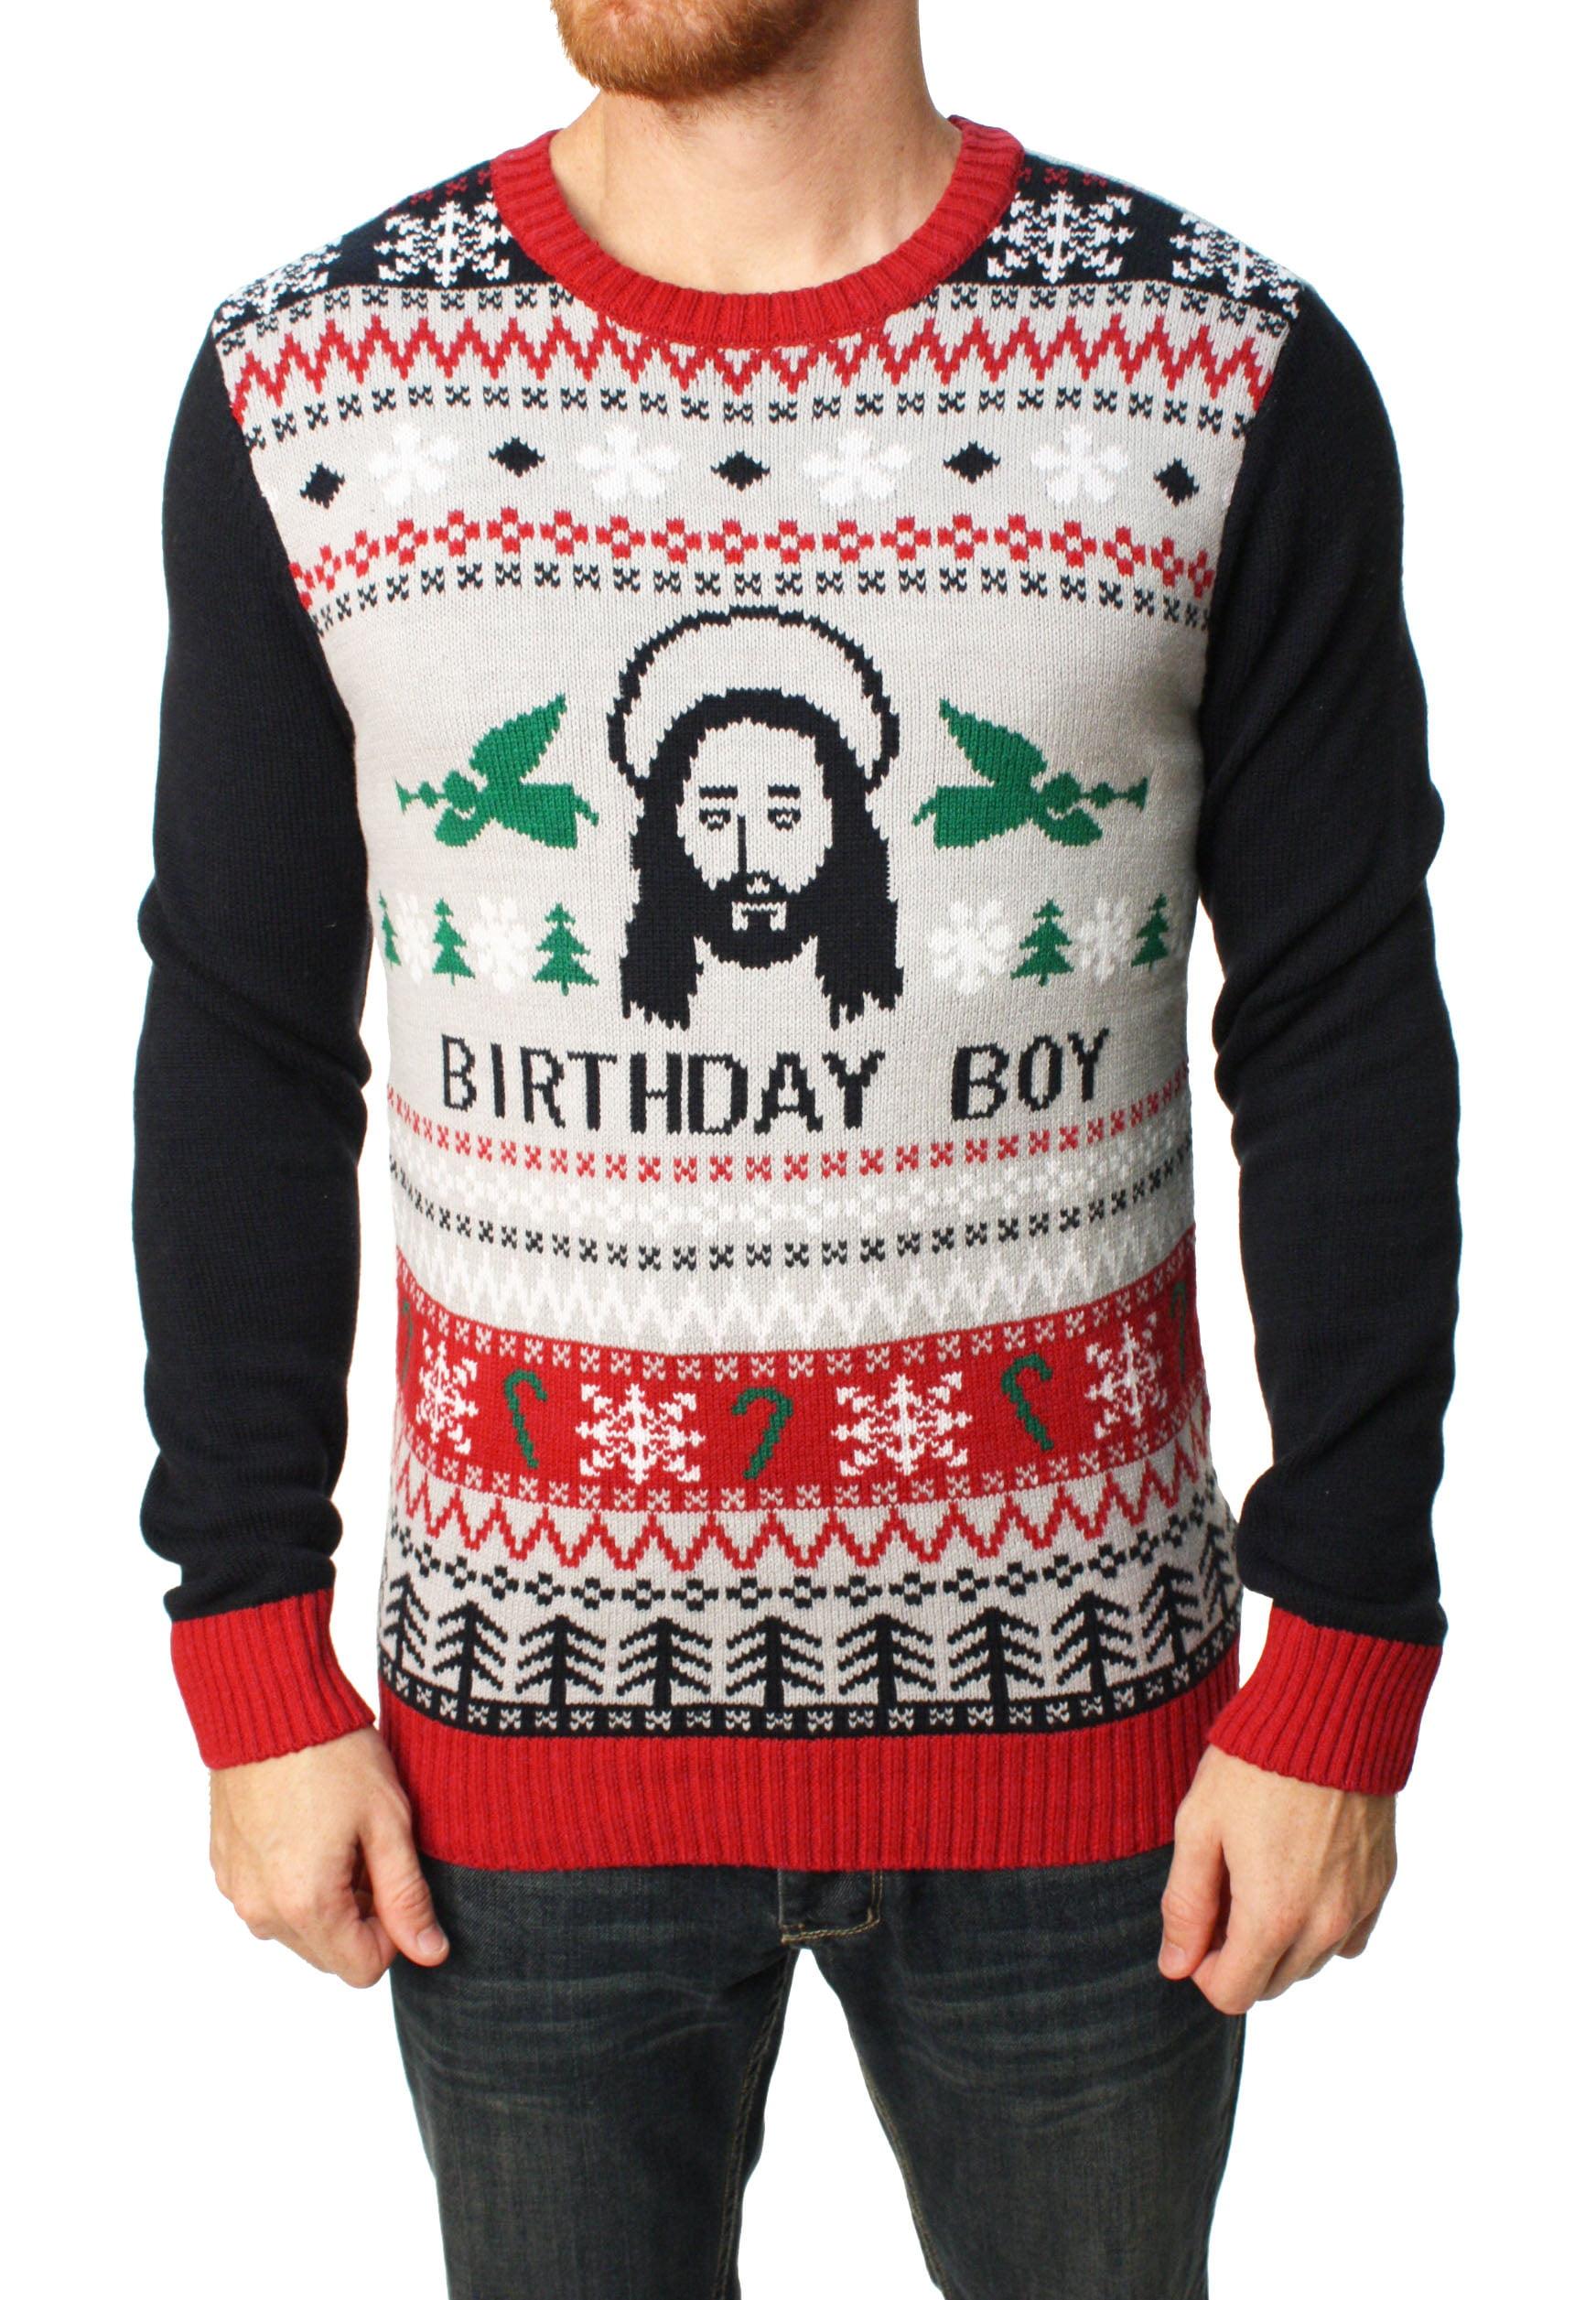 jesus birthday boy sweater Ugly Christmas Sweater   Ugly Christmas Sweater Men's Jesus  jesus birthday boy sweater